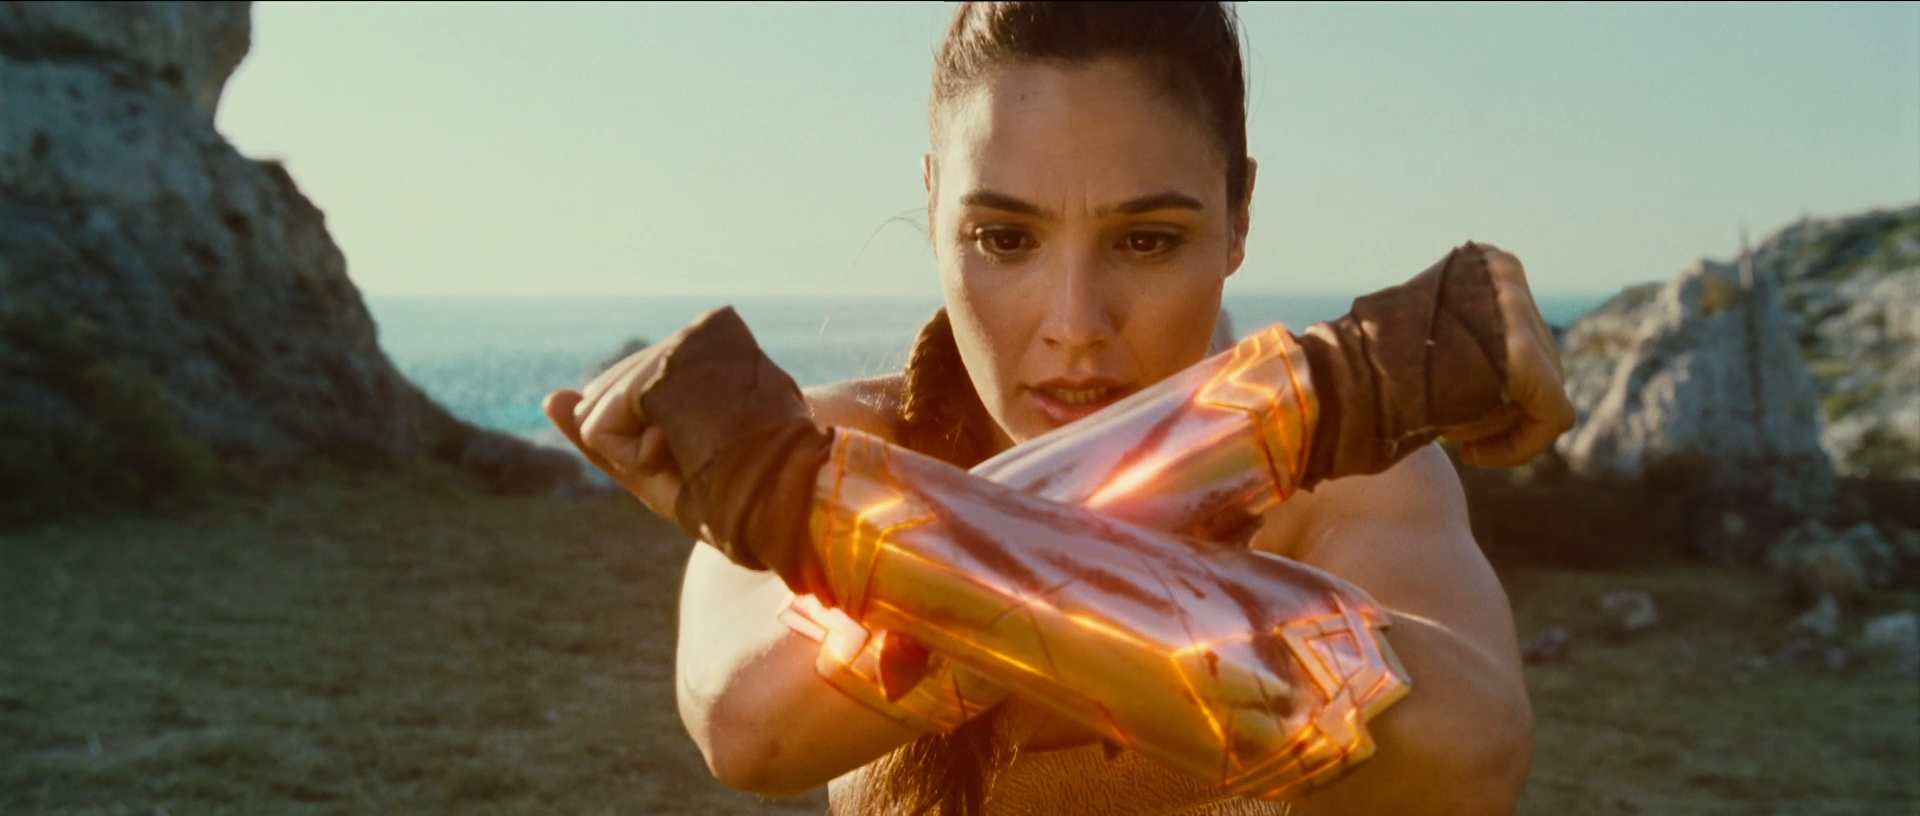 Image - Wonder Woman March 2017 Trailer 037.png | Wonder ...